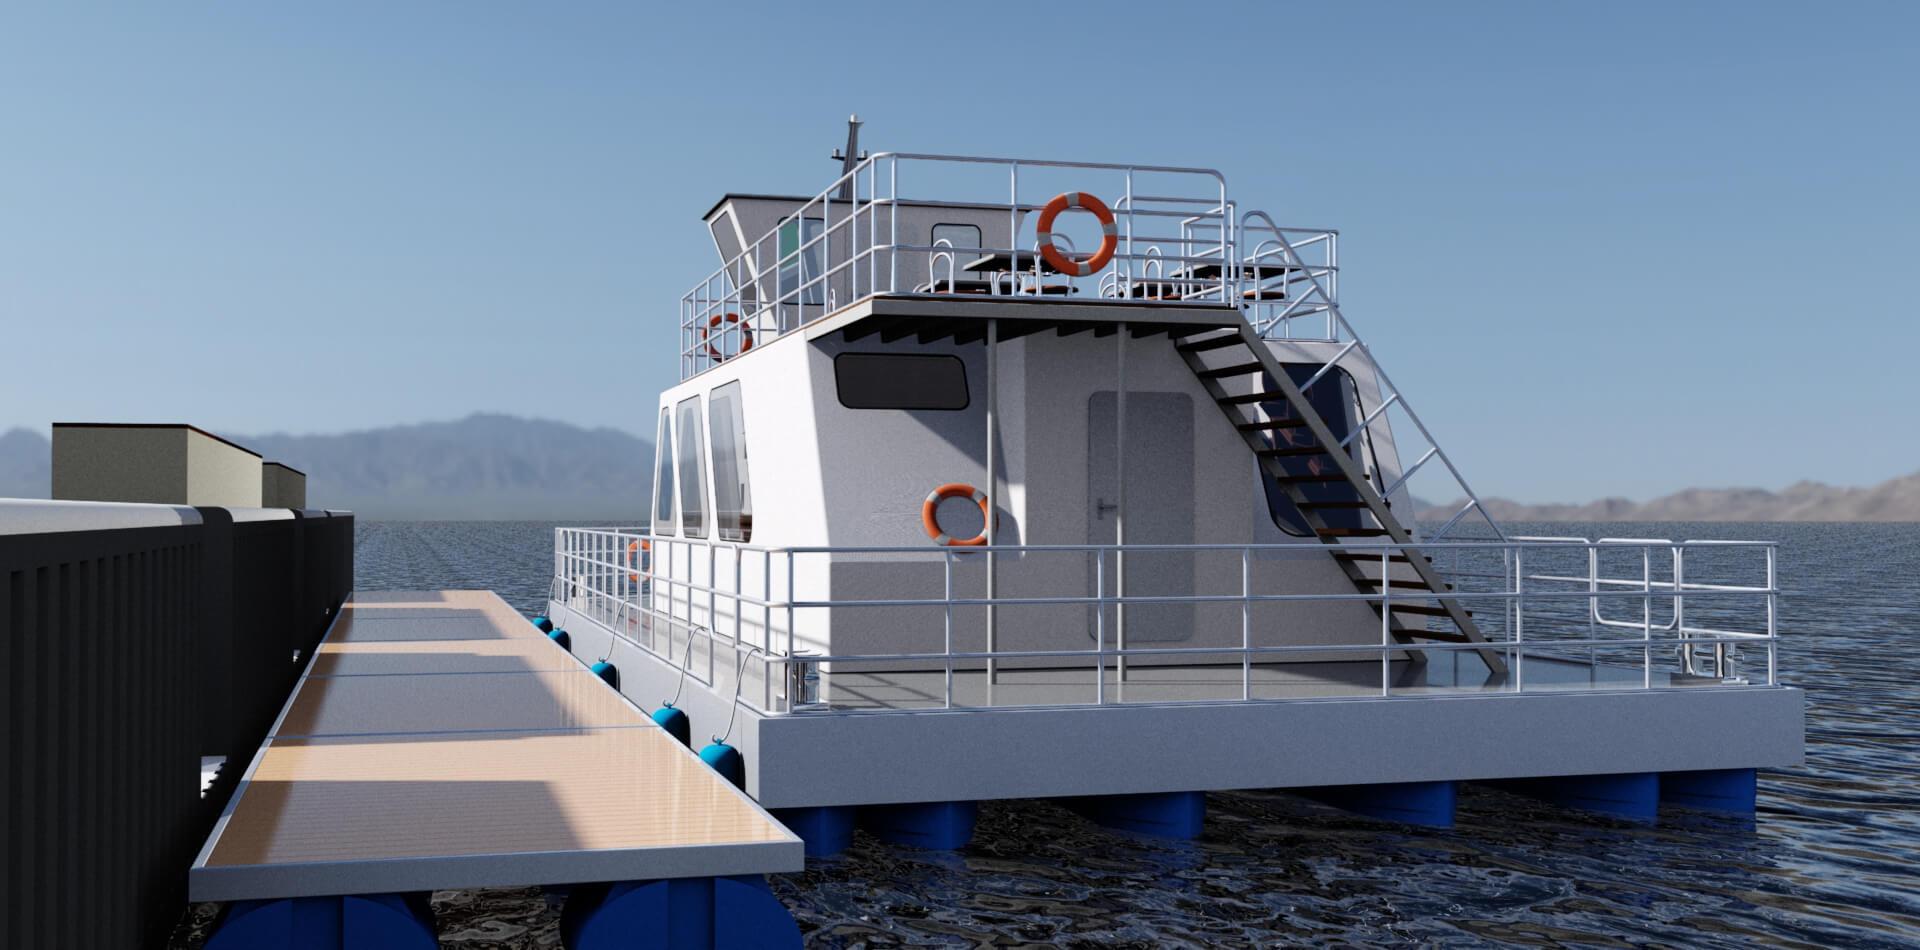 Design of a ferry